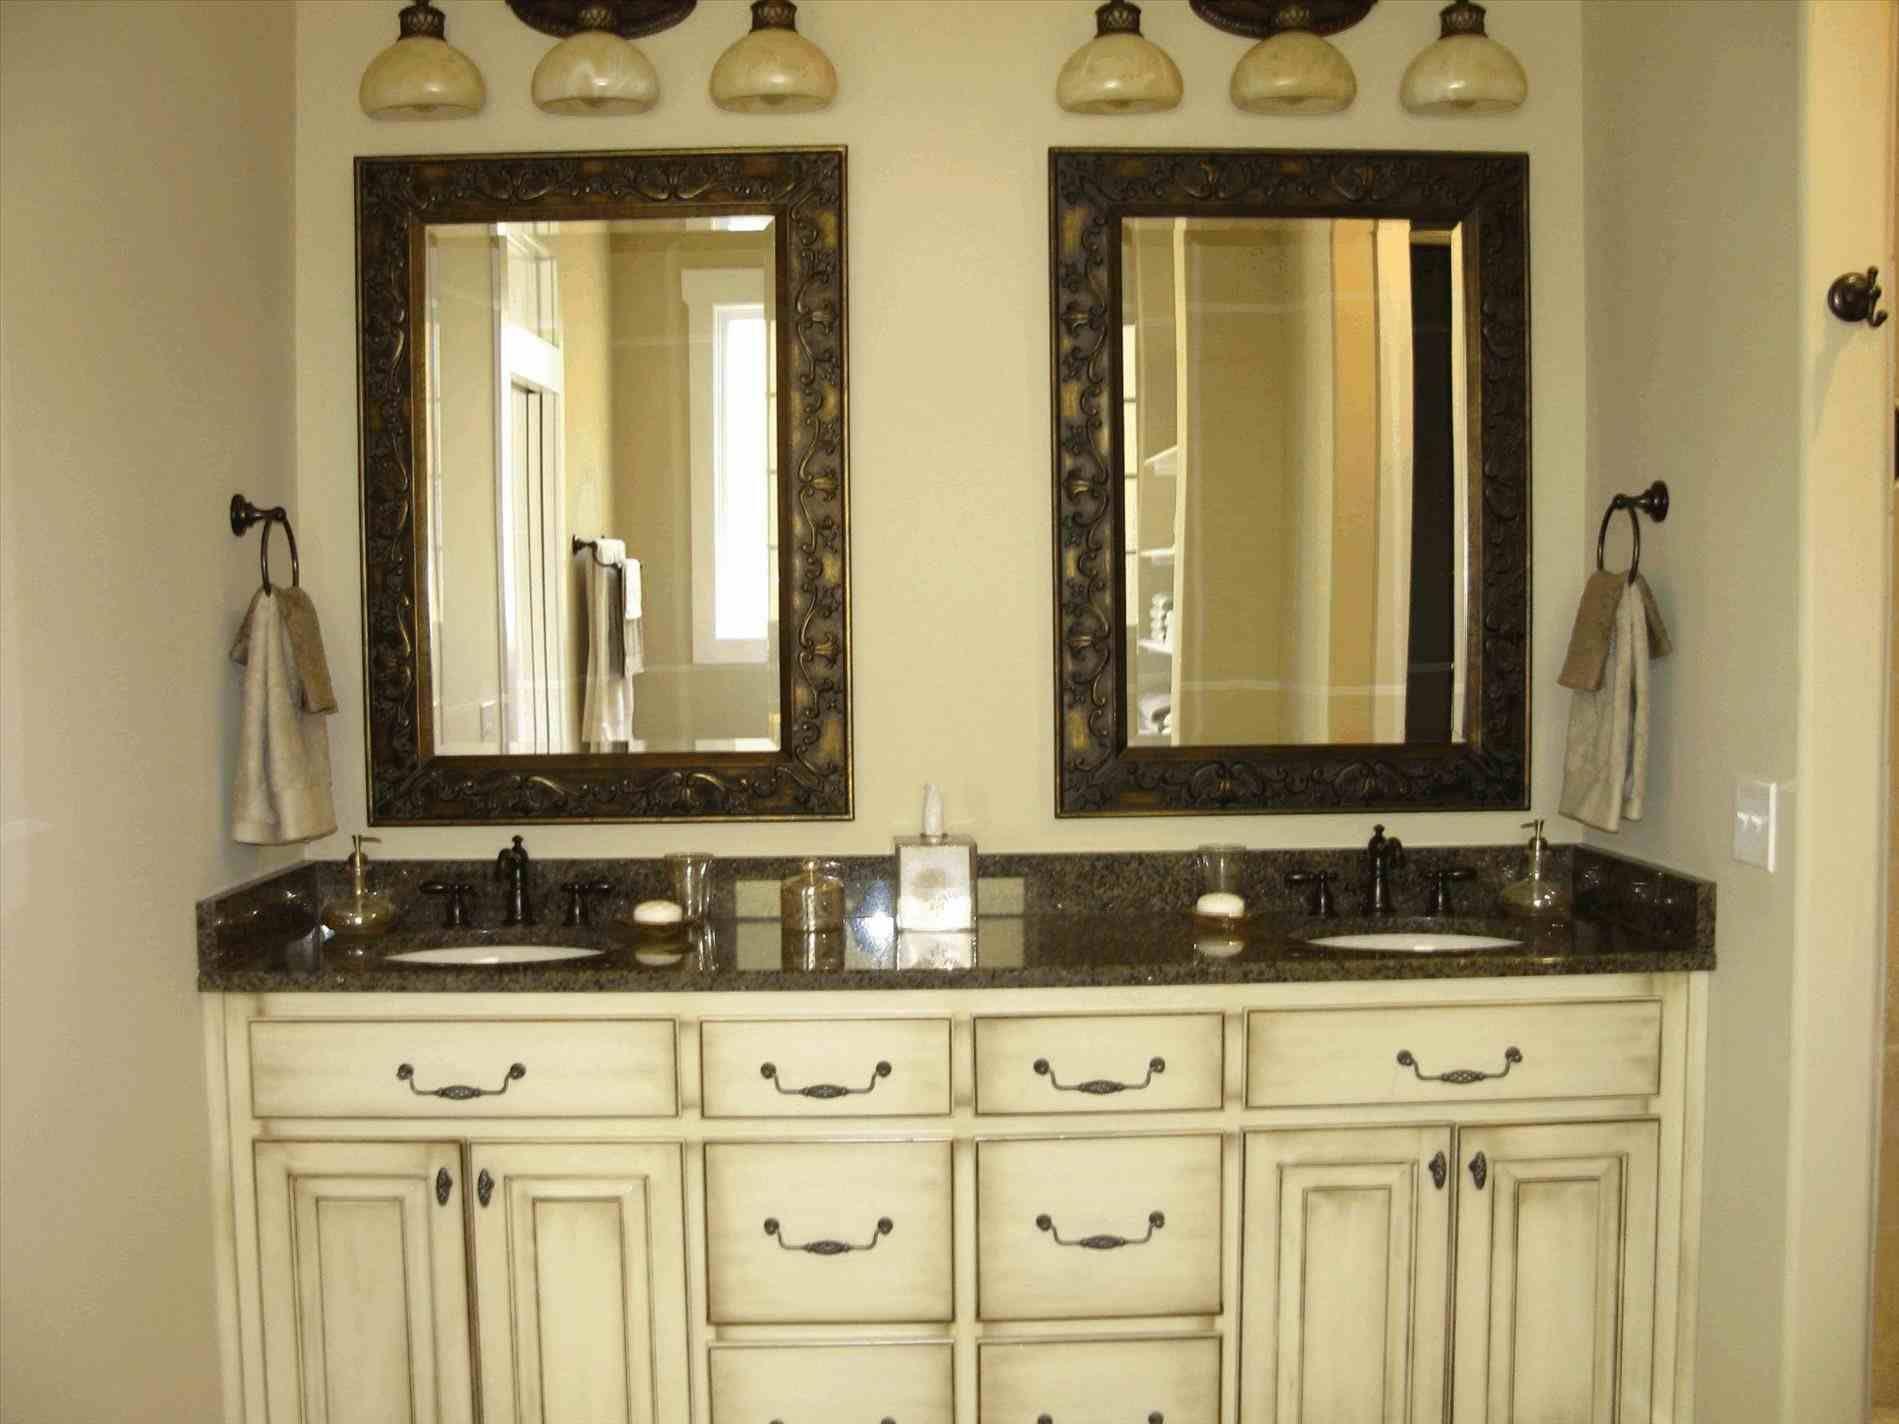 bathroom countertop organizer | Pinterest | Countertop, Bathroom ...